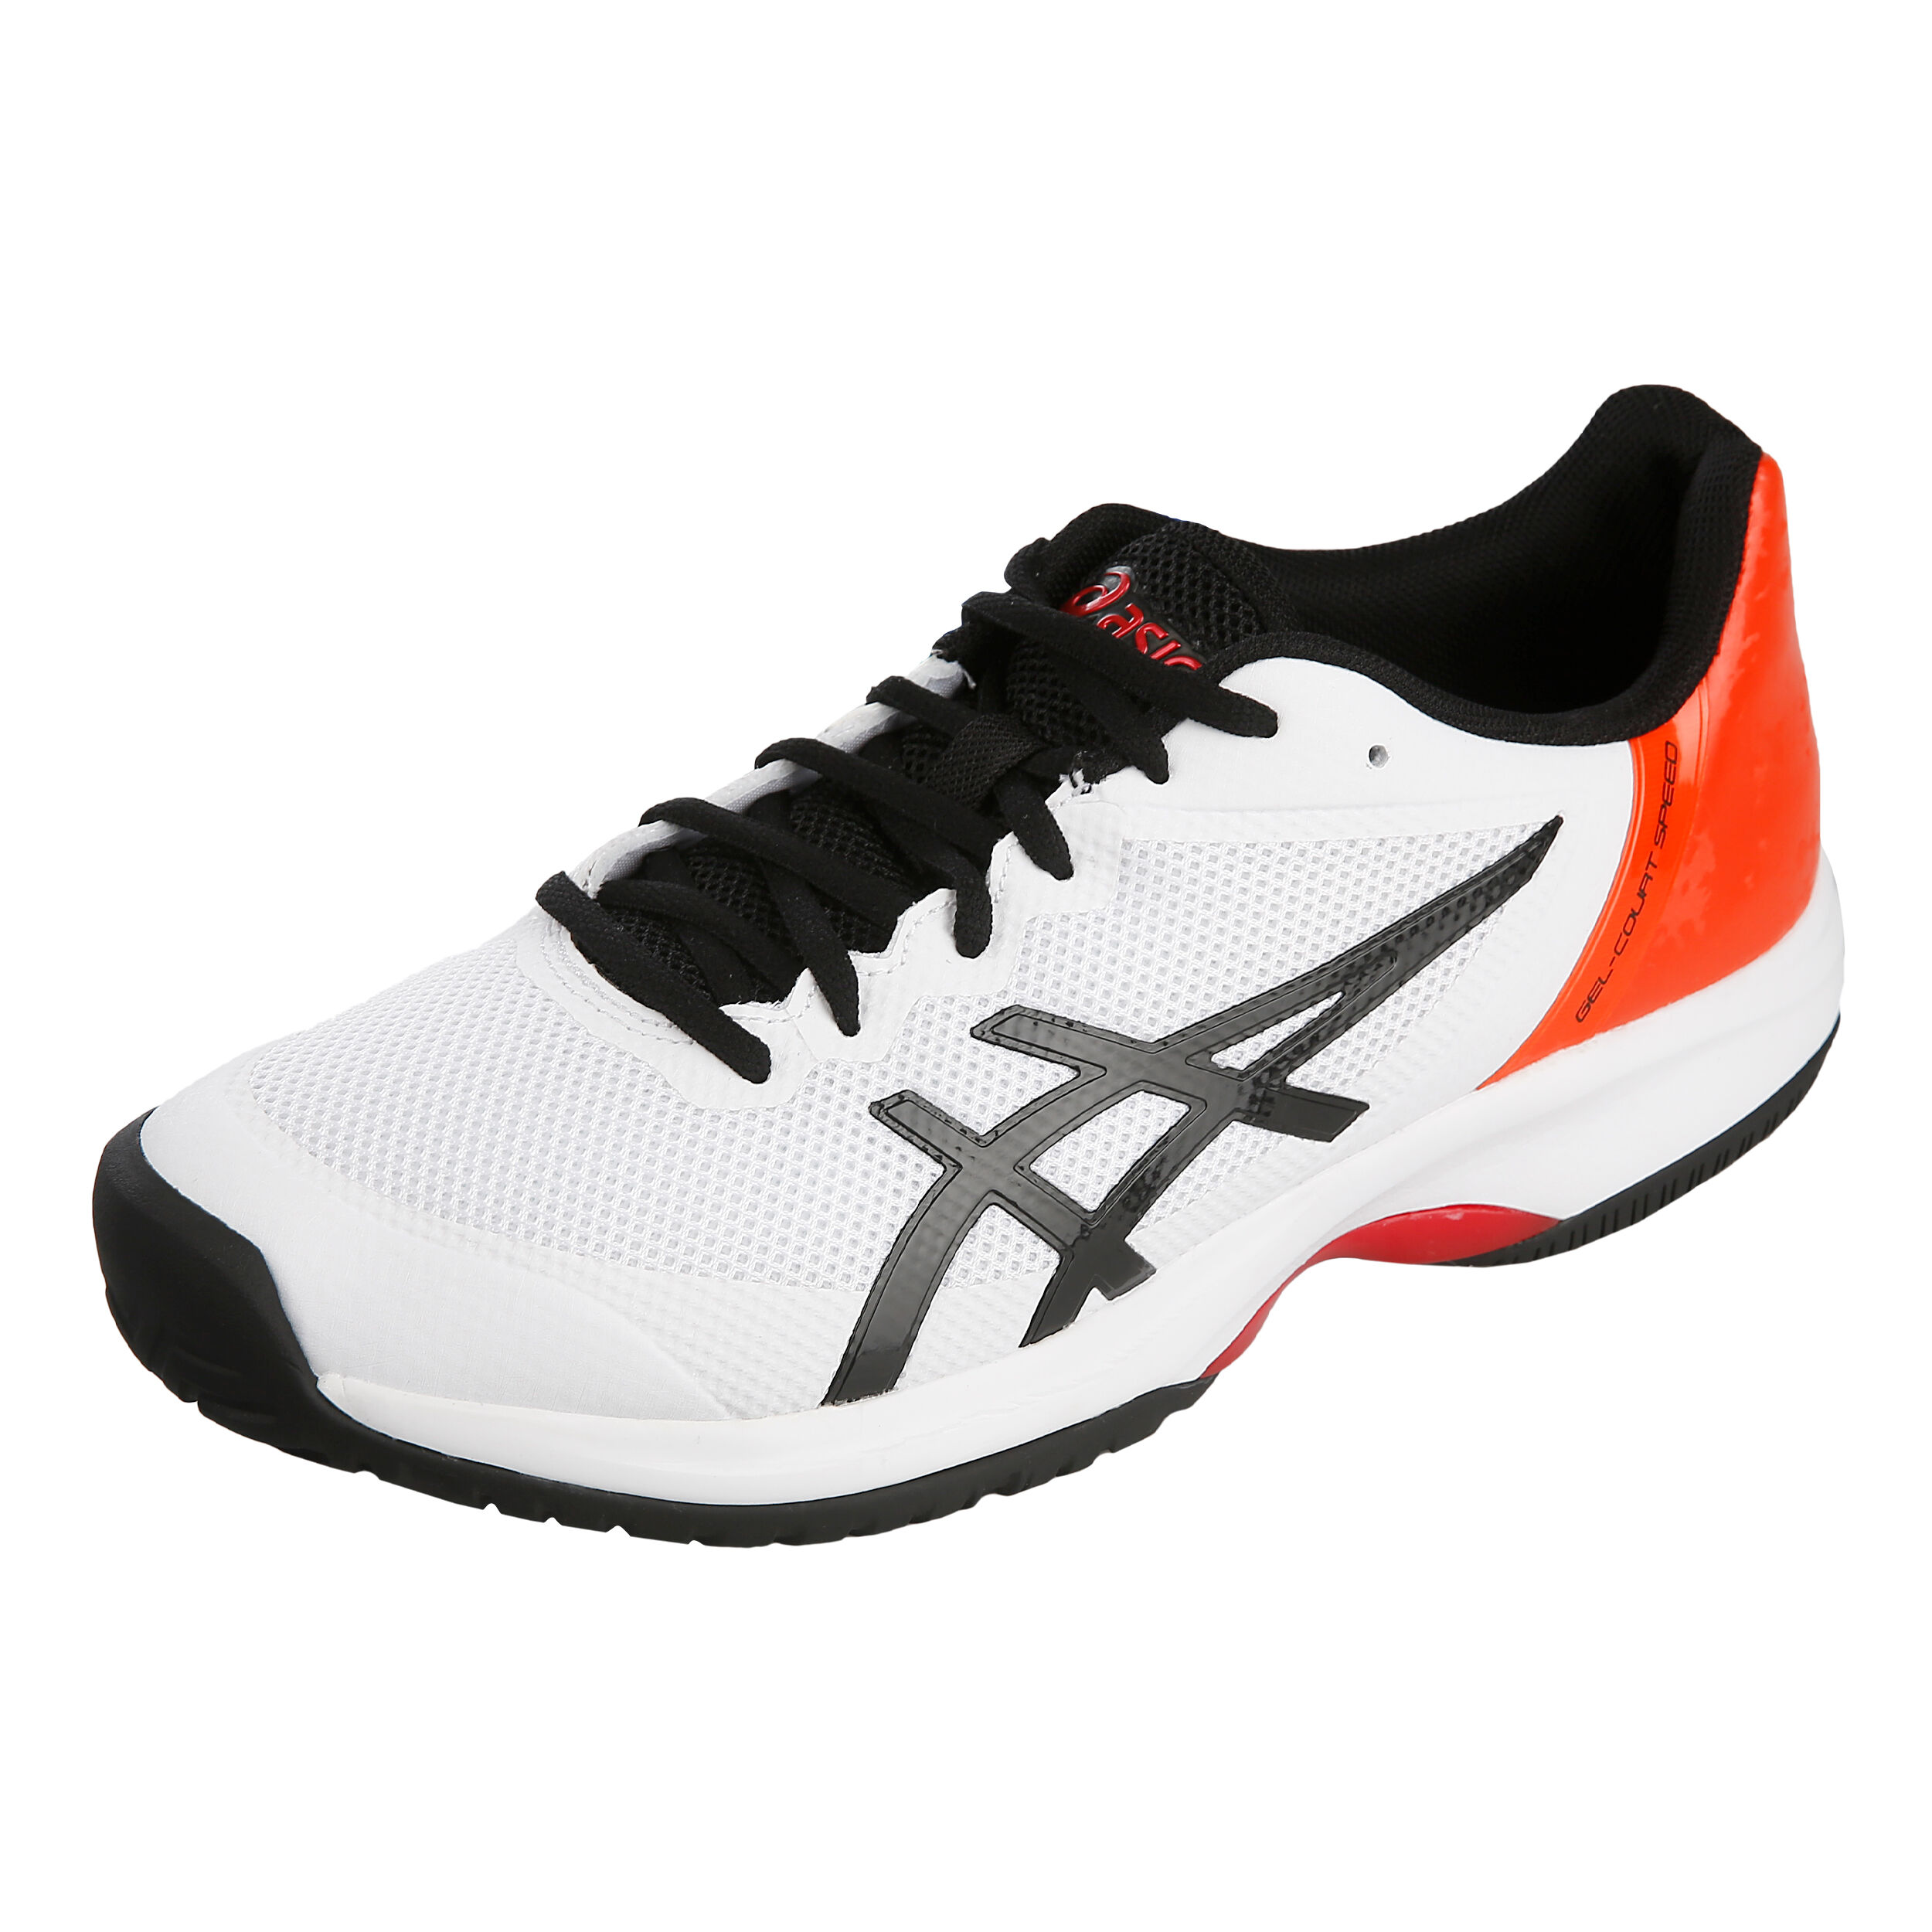 Chaussures Speed achat vente de Chaussures pas cher